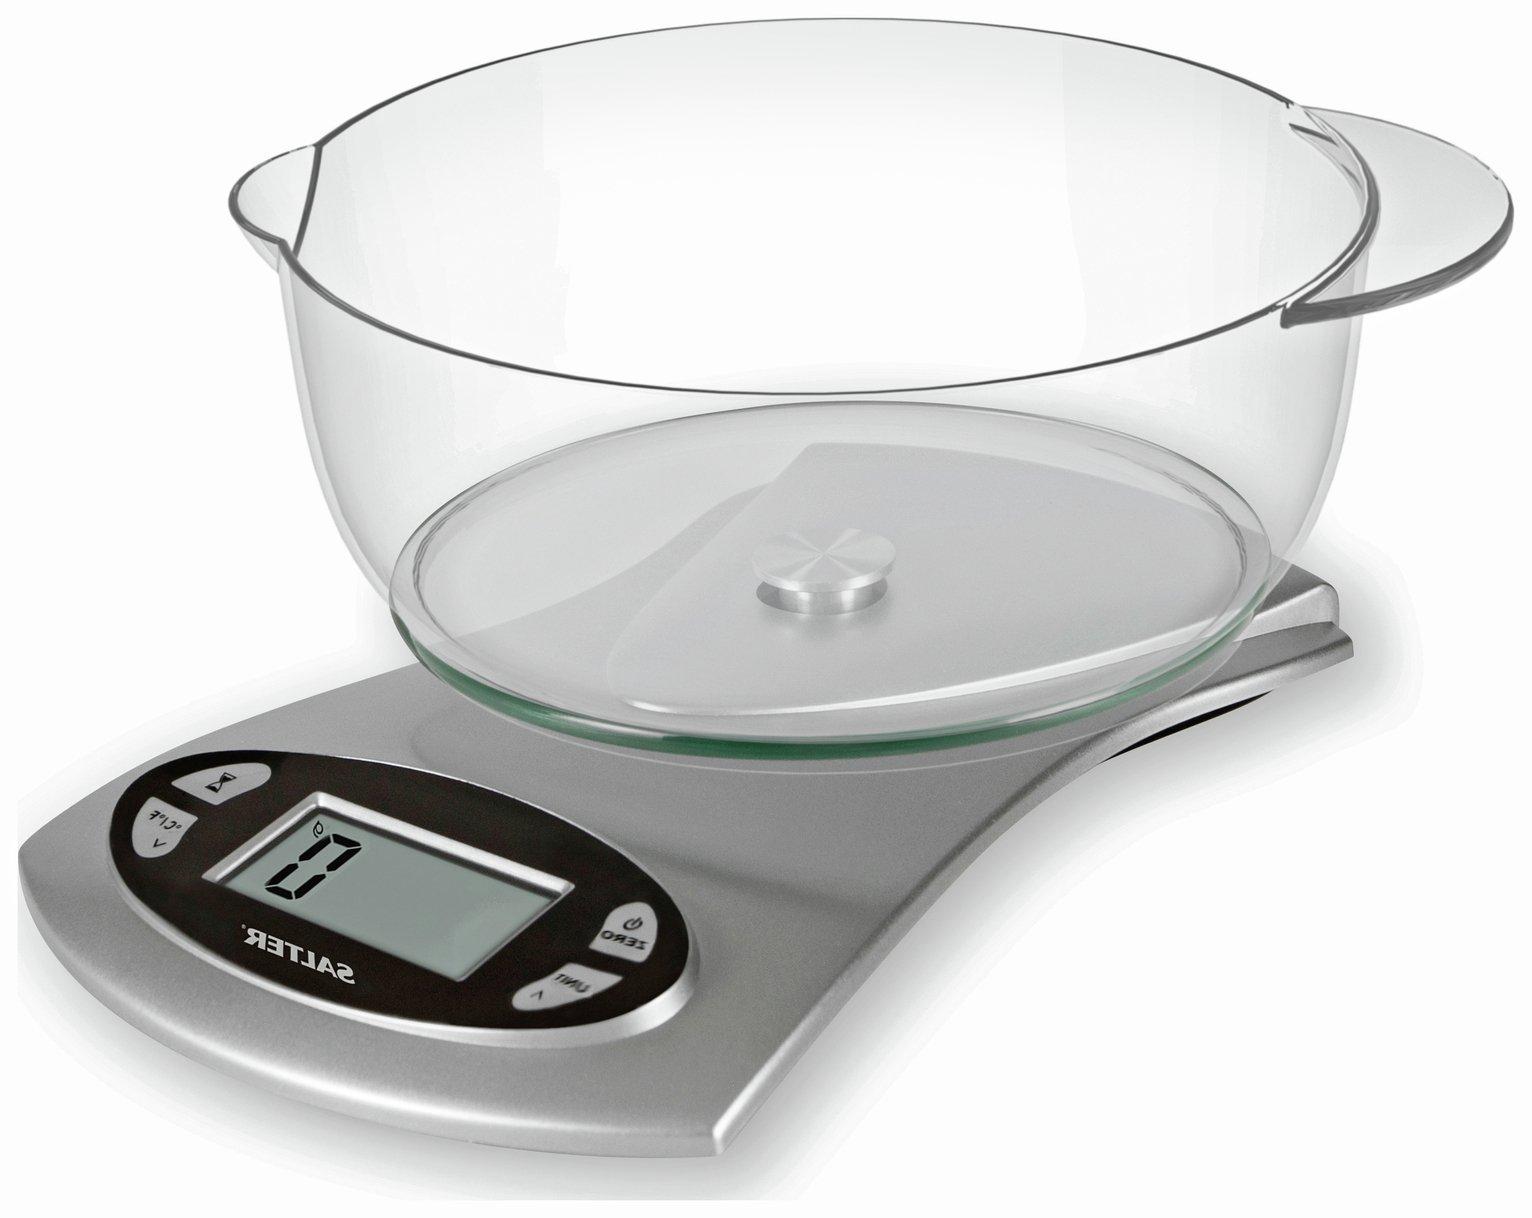 Salter Precision kitchen scale and bowl £3.76 @ Asda Hyson Green Nottingham